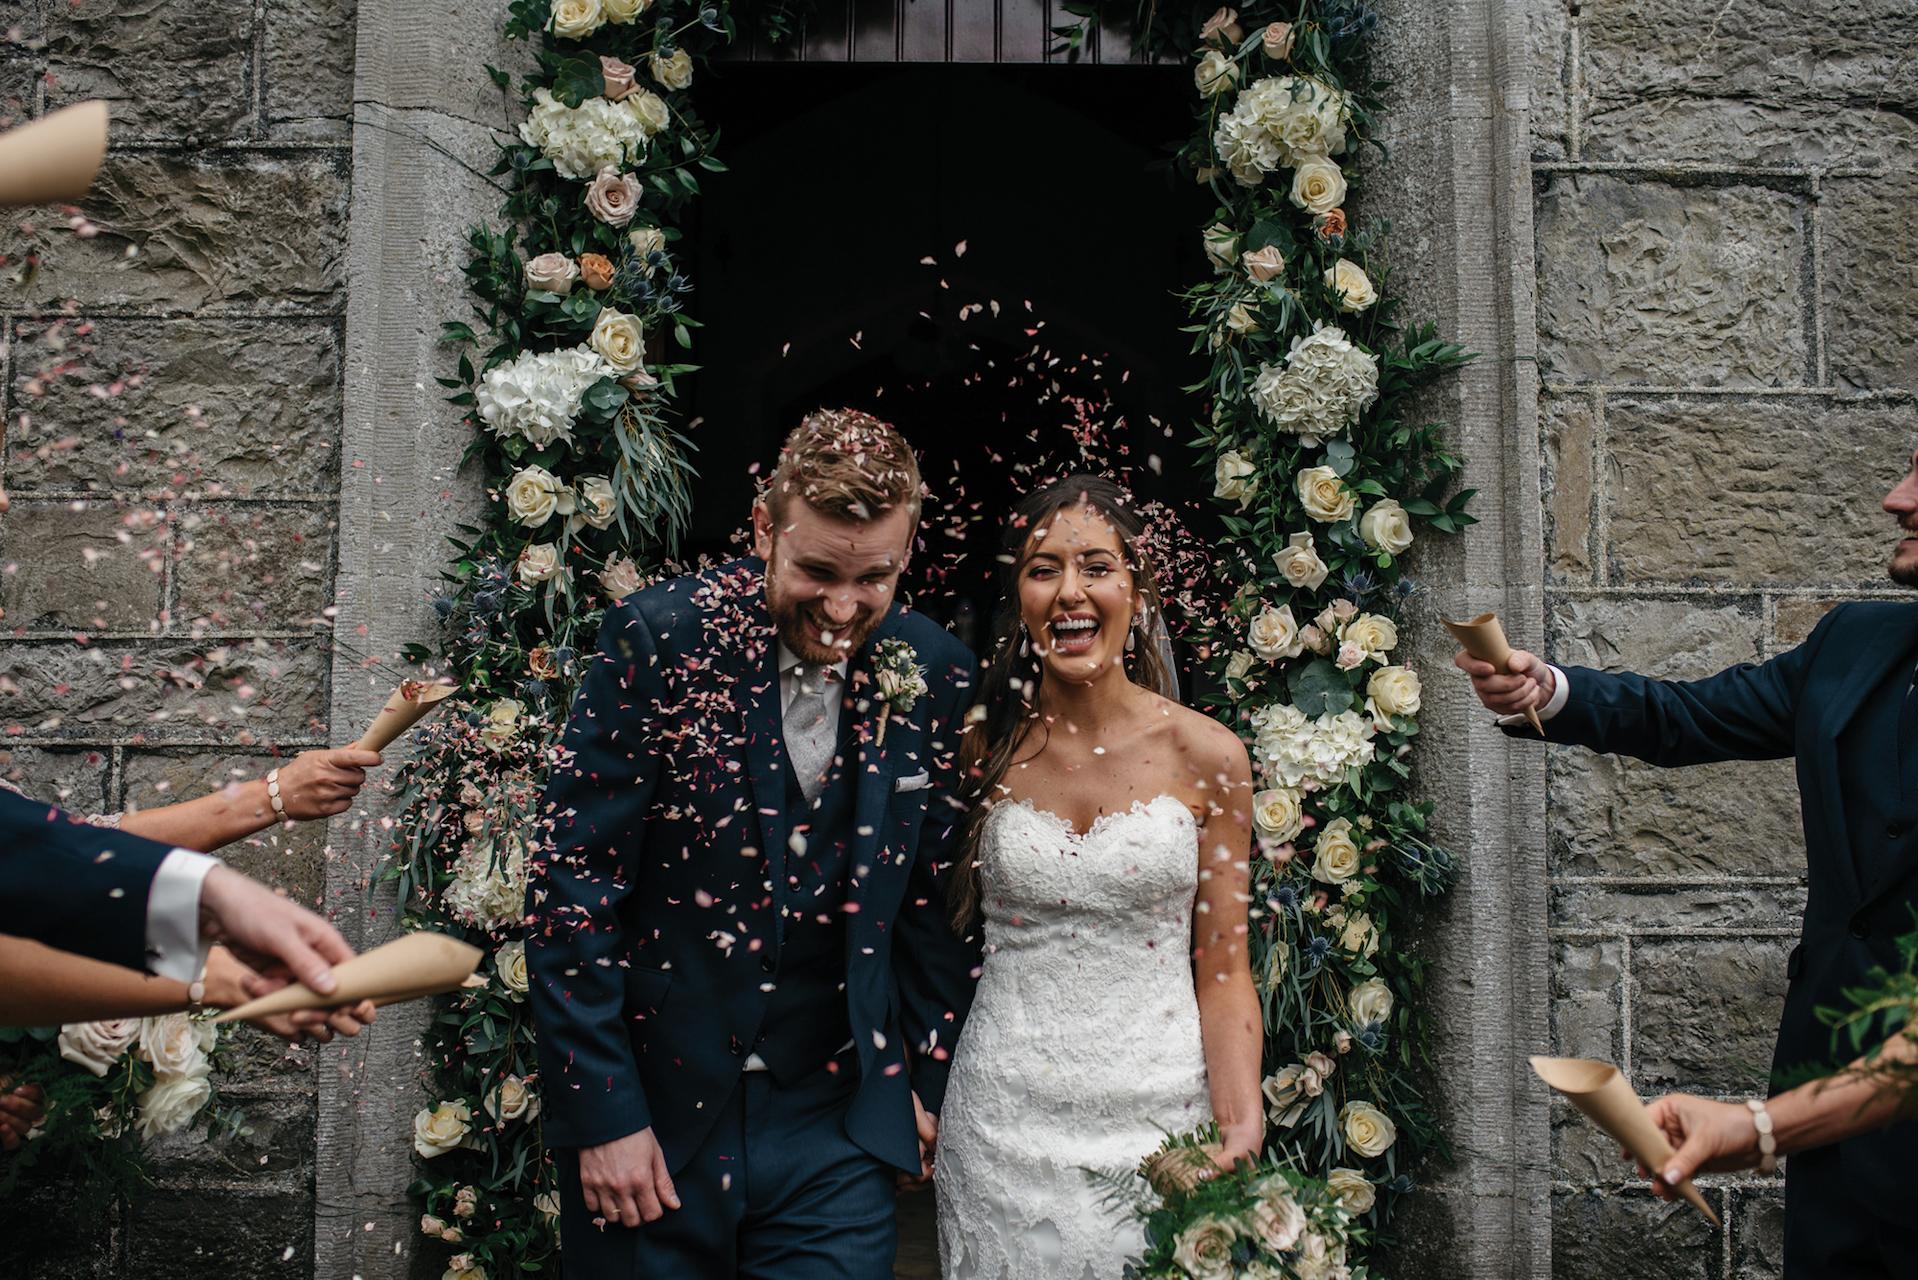 Fleuriste - Wedding Flowers